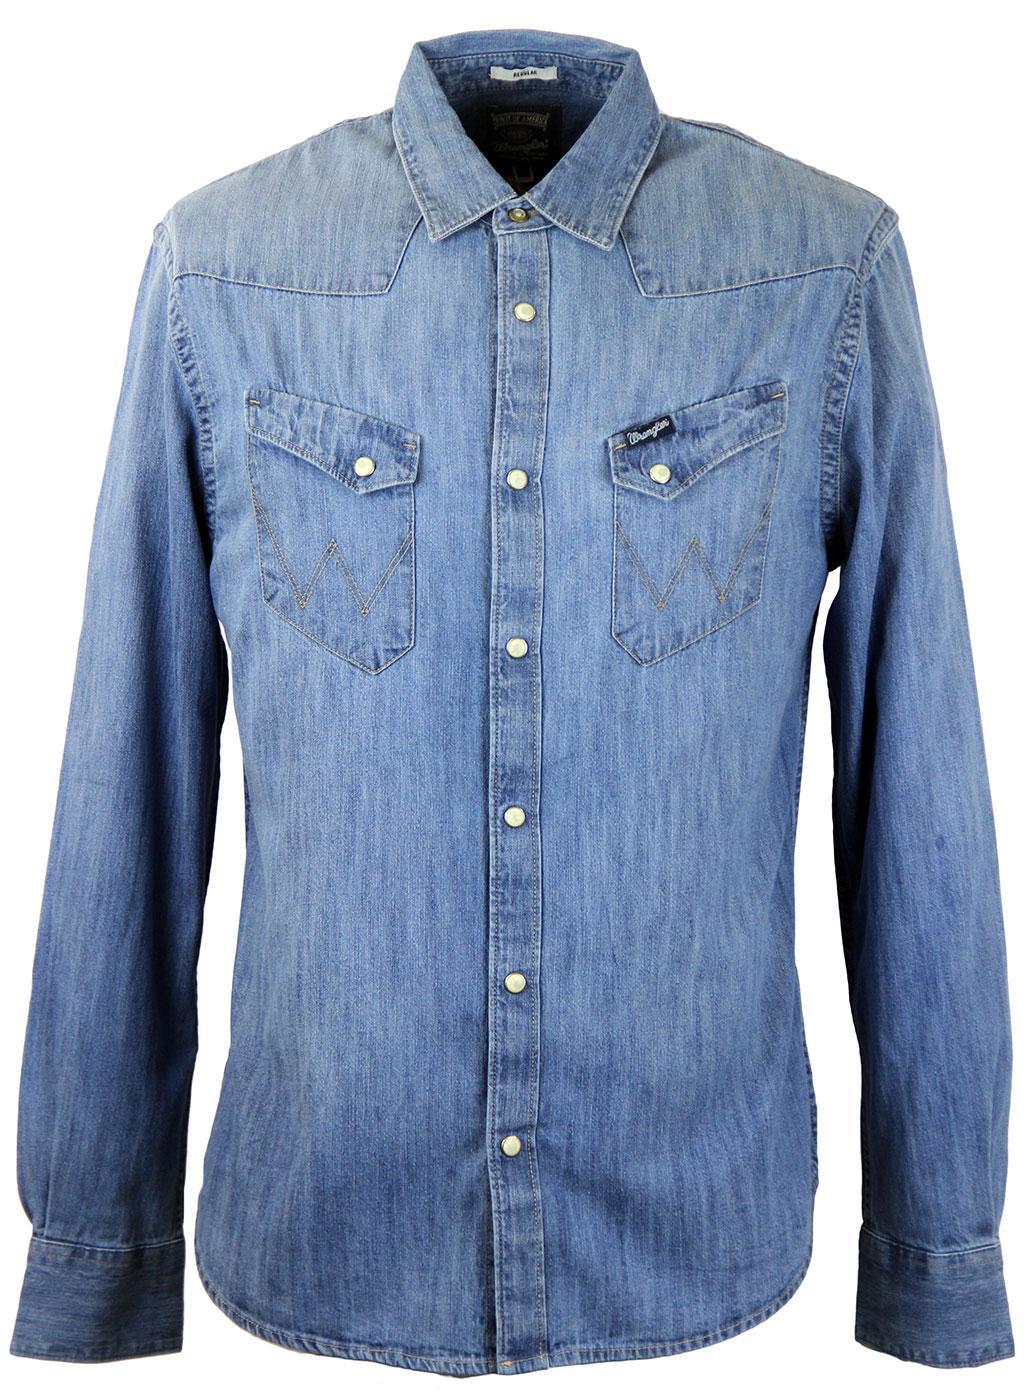 b0f53f11ba WRANGLER Retro 70s Indie L S Denim Western Shirt in Light Indigo